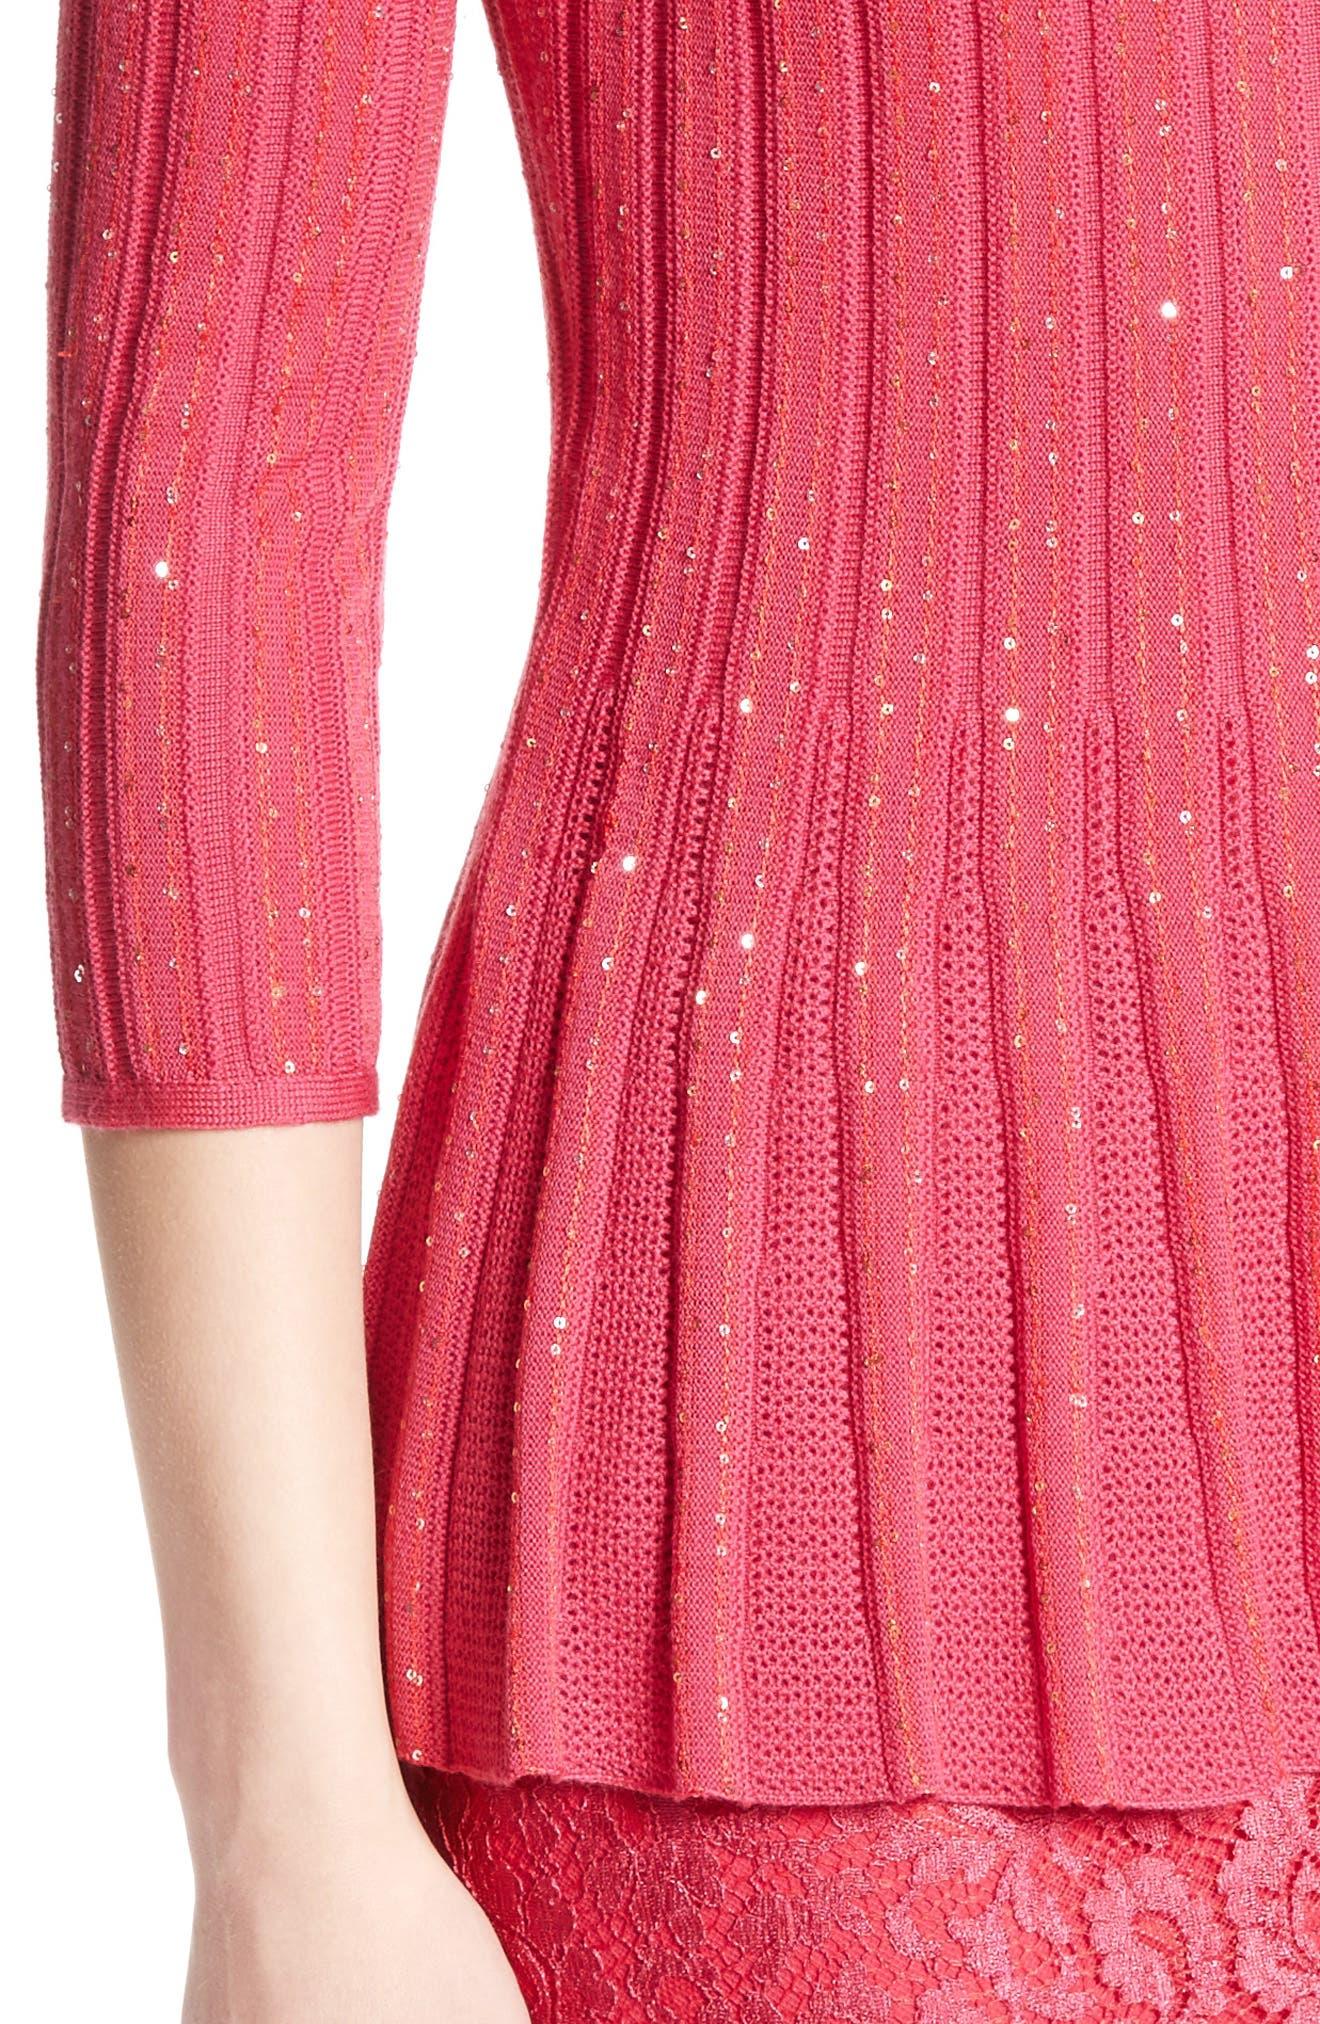 Chriag Sequin Knit Peplum Top,                             Alternate thumbnail 4, color,